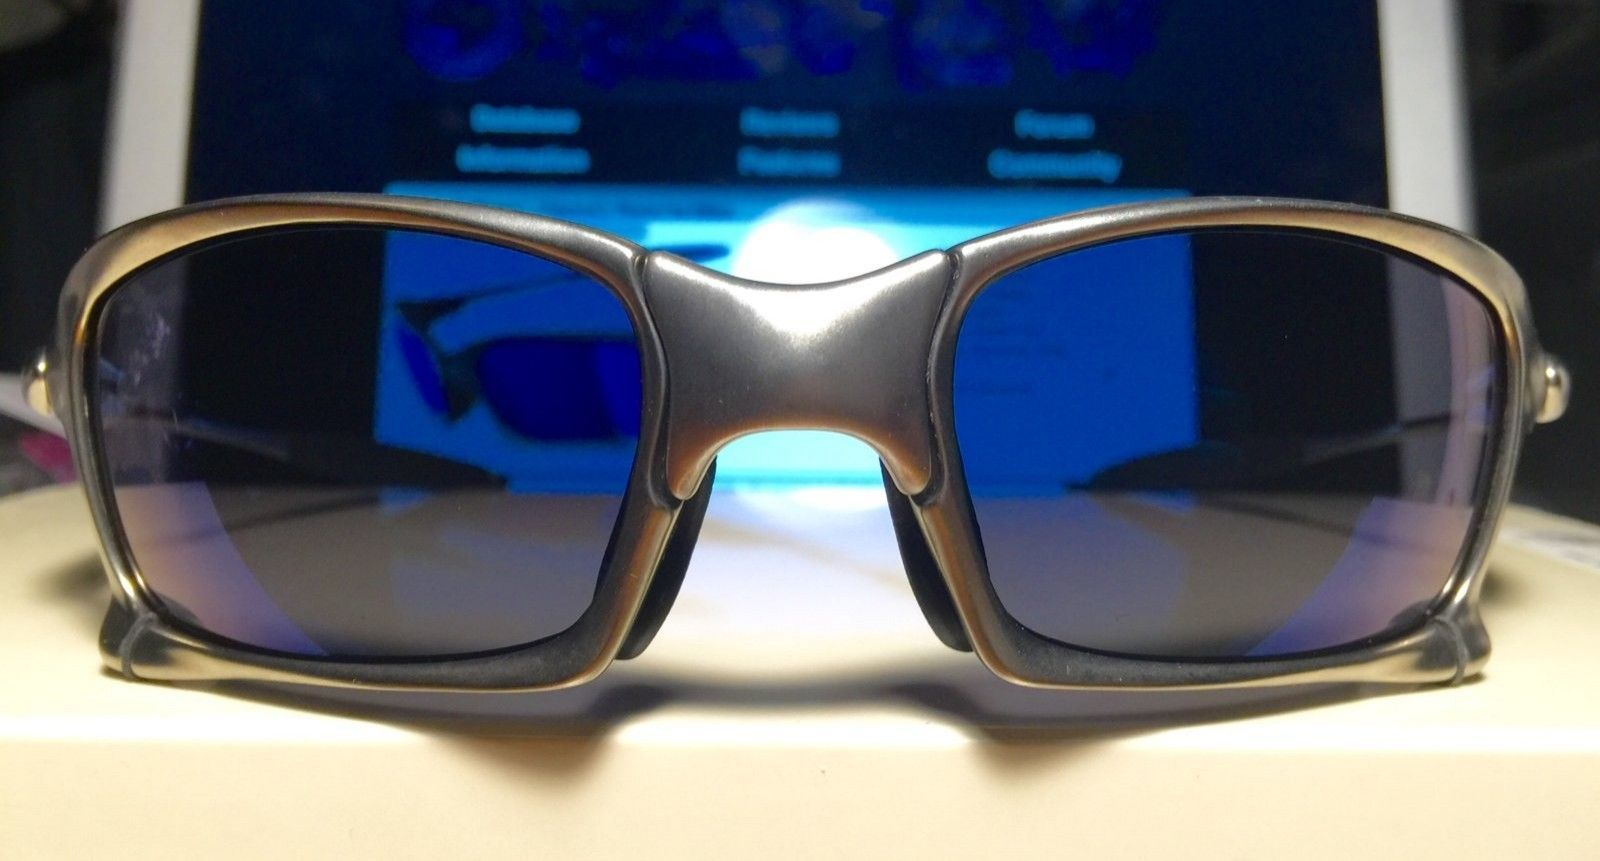 NEW X Squared Plasma Ice Iridium - image.jpeg